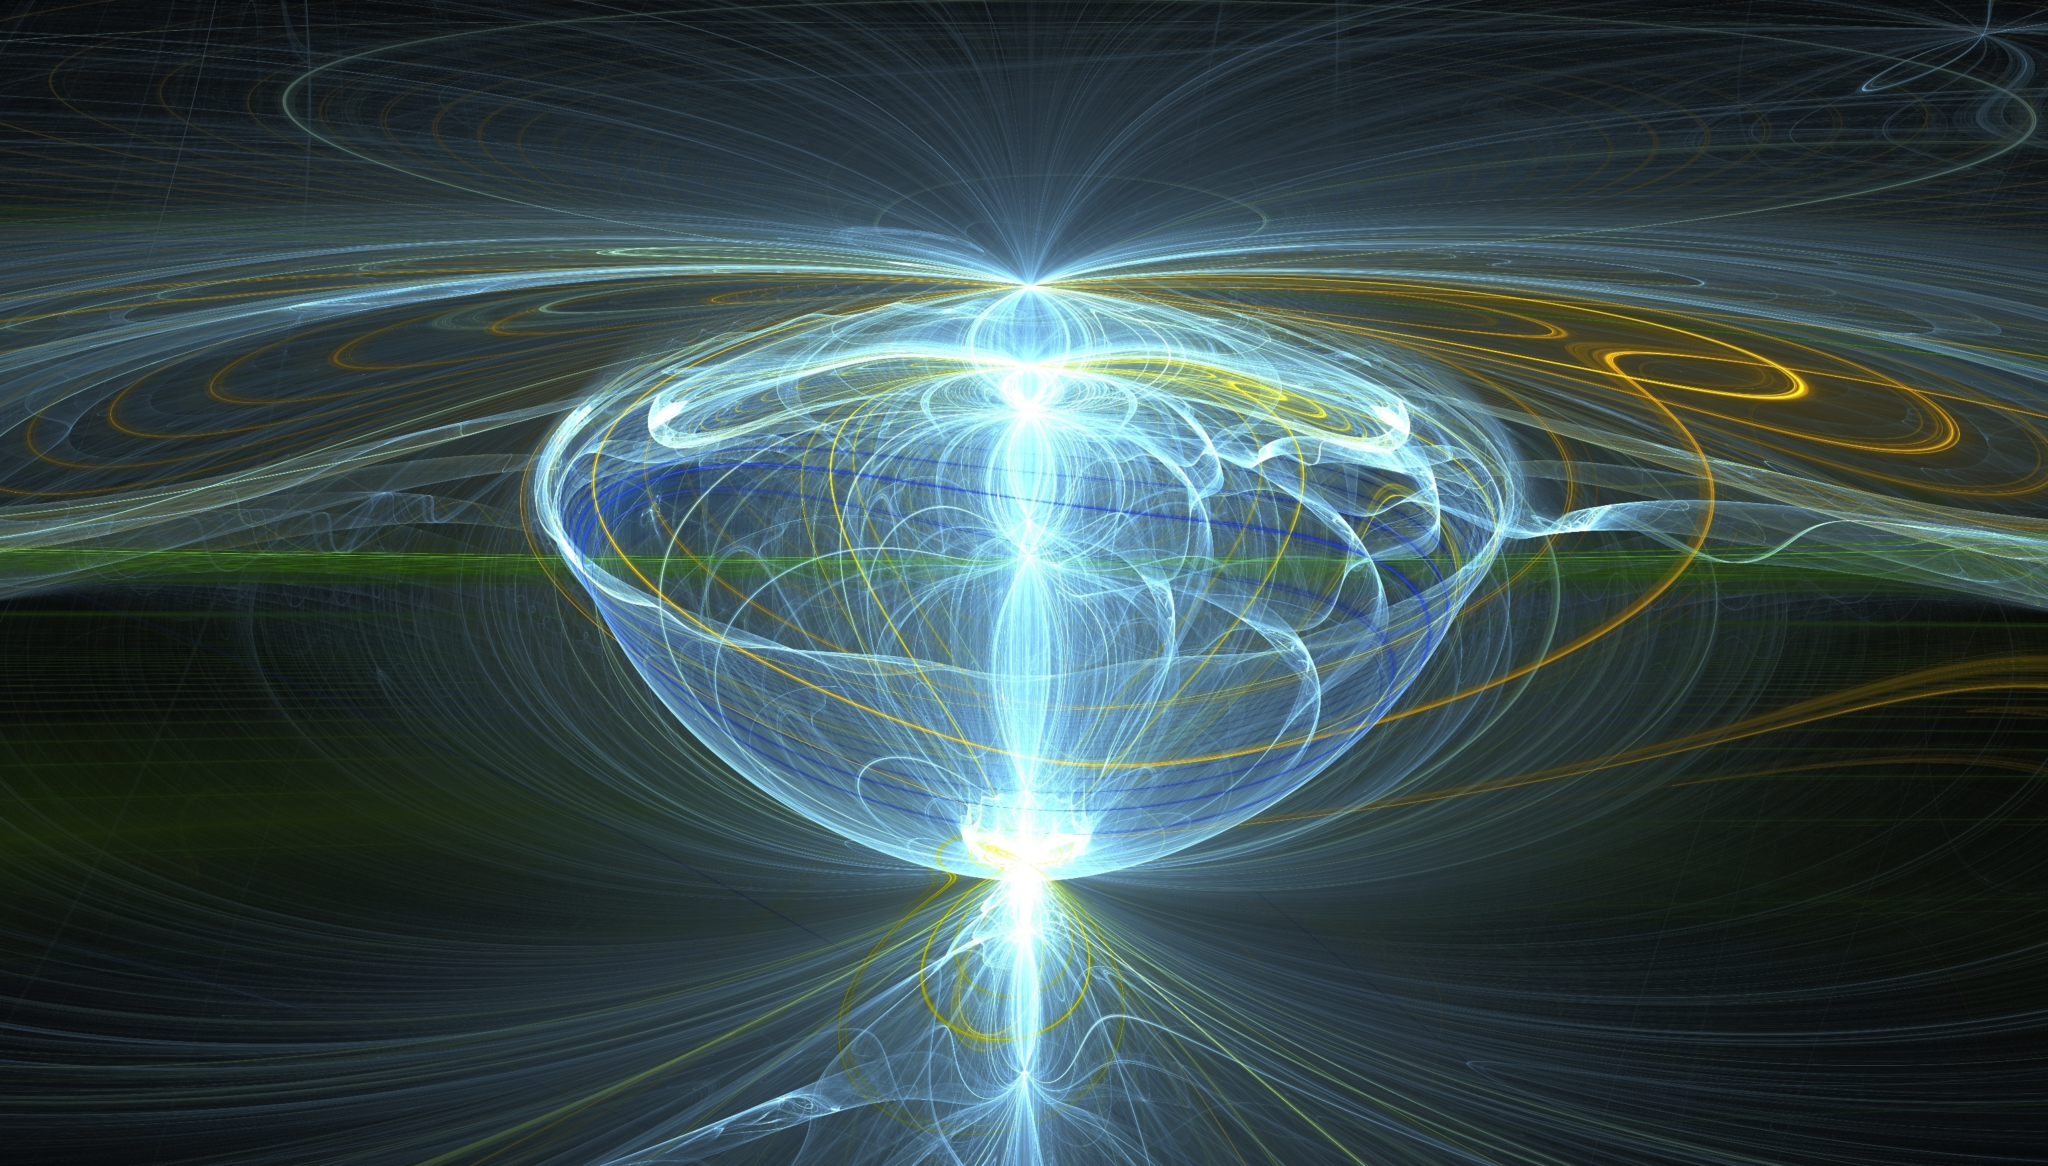 Elektromanyetik Kuvvet Nedir